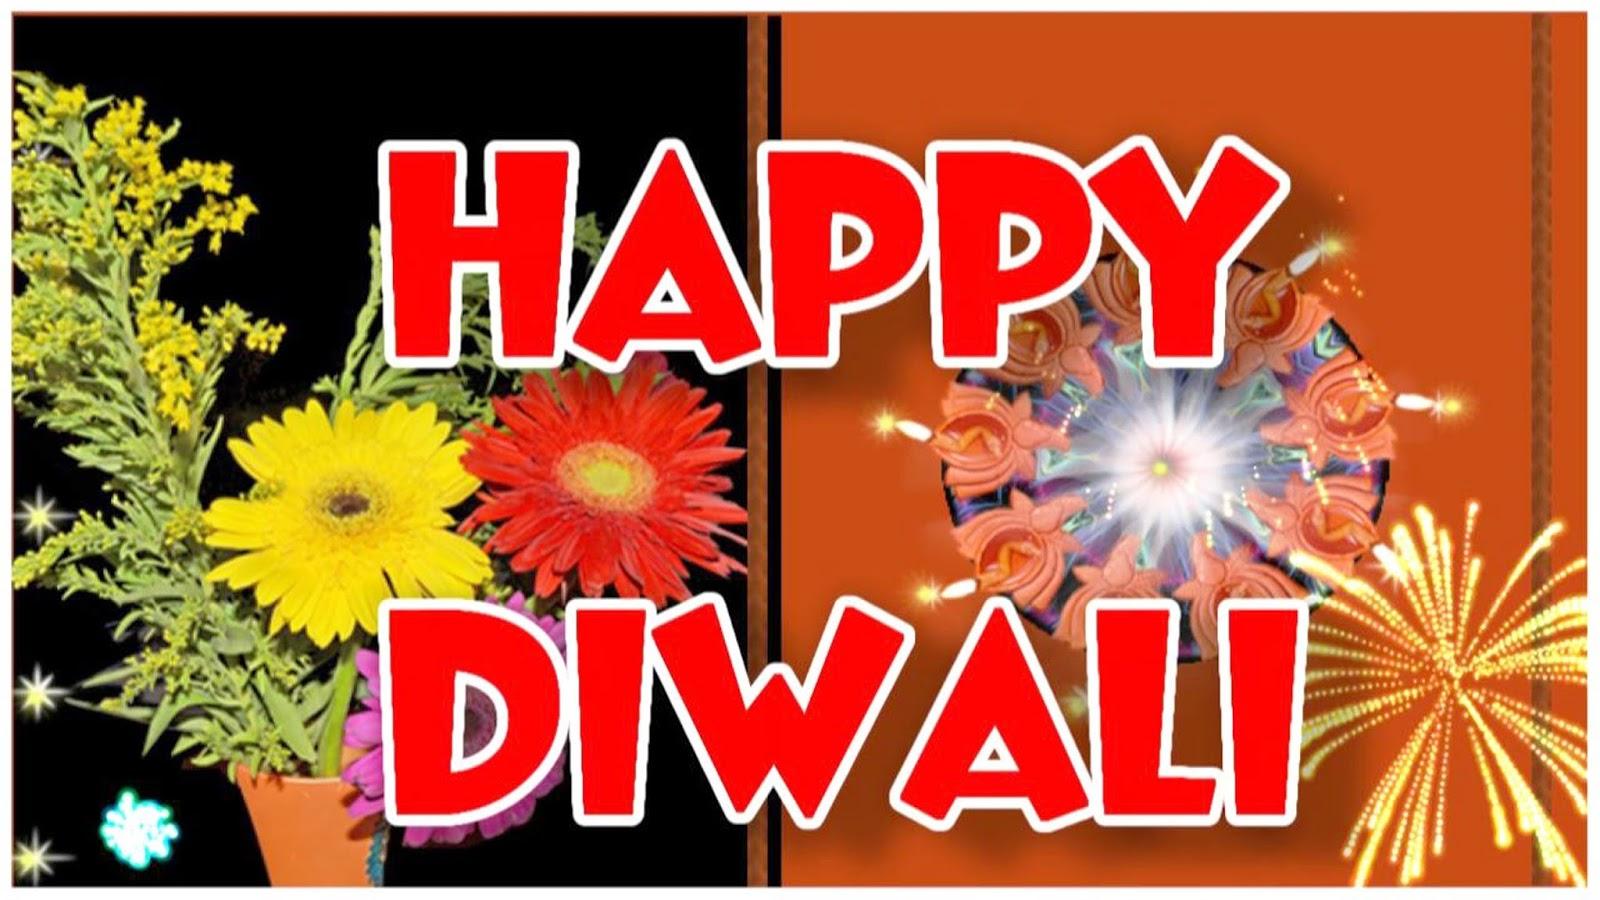 Top 20 Happy Diwali E Cards 2016 Best Diwalideepawali E Cards